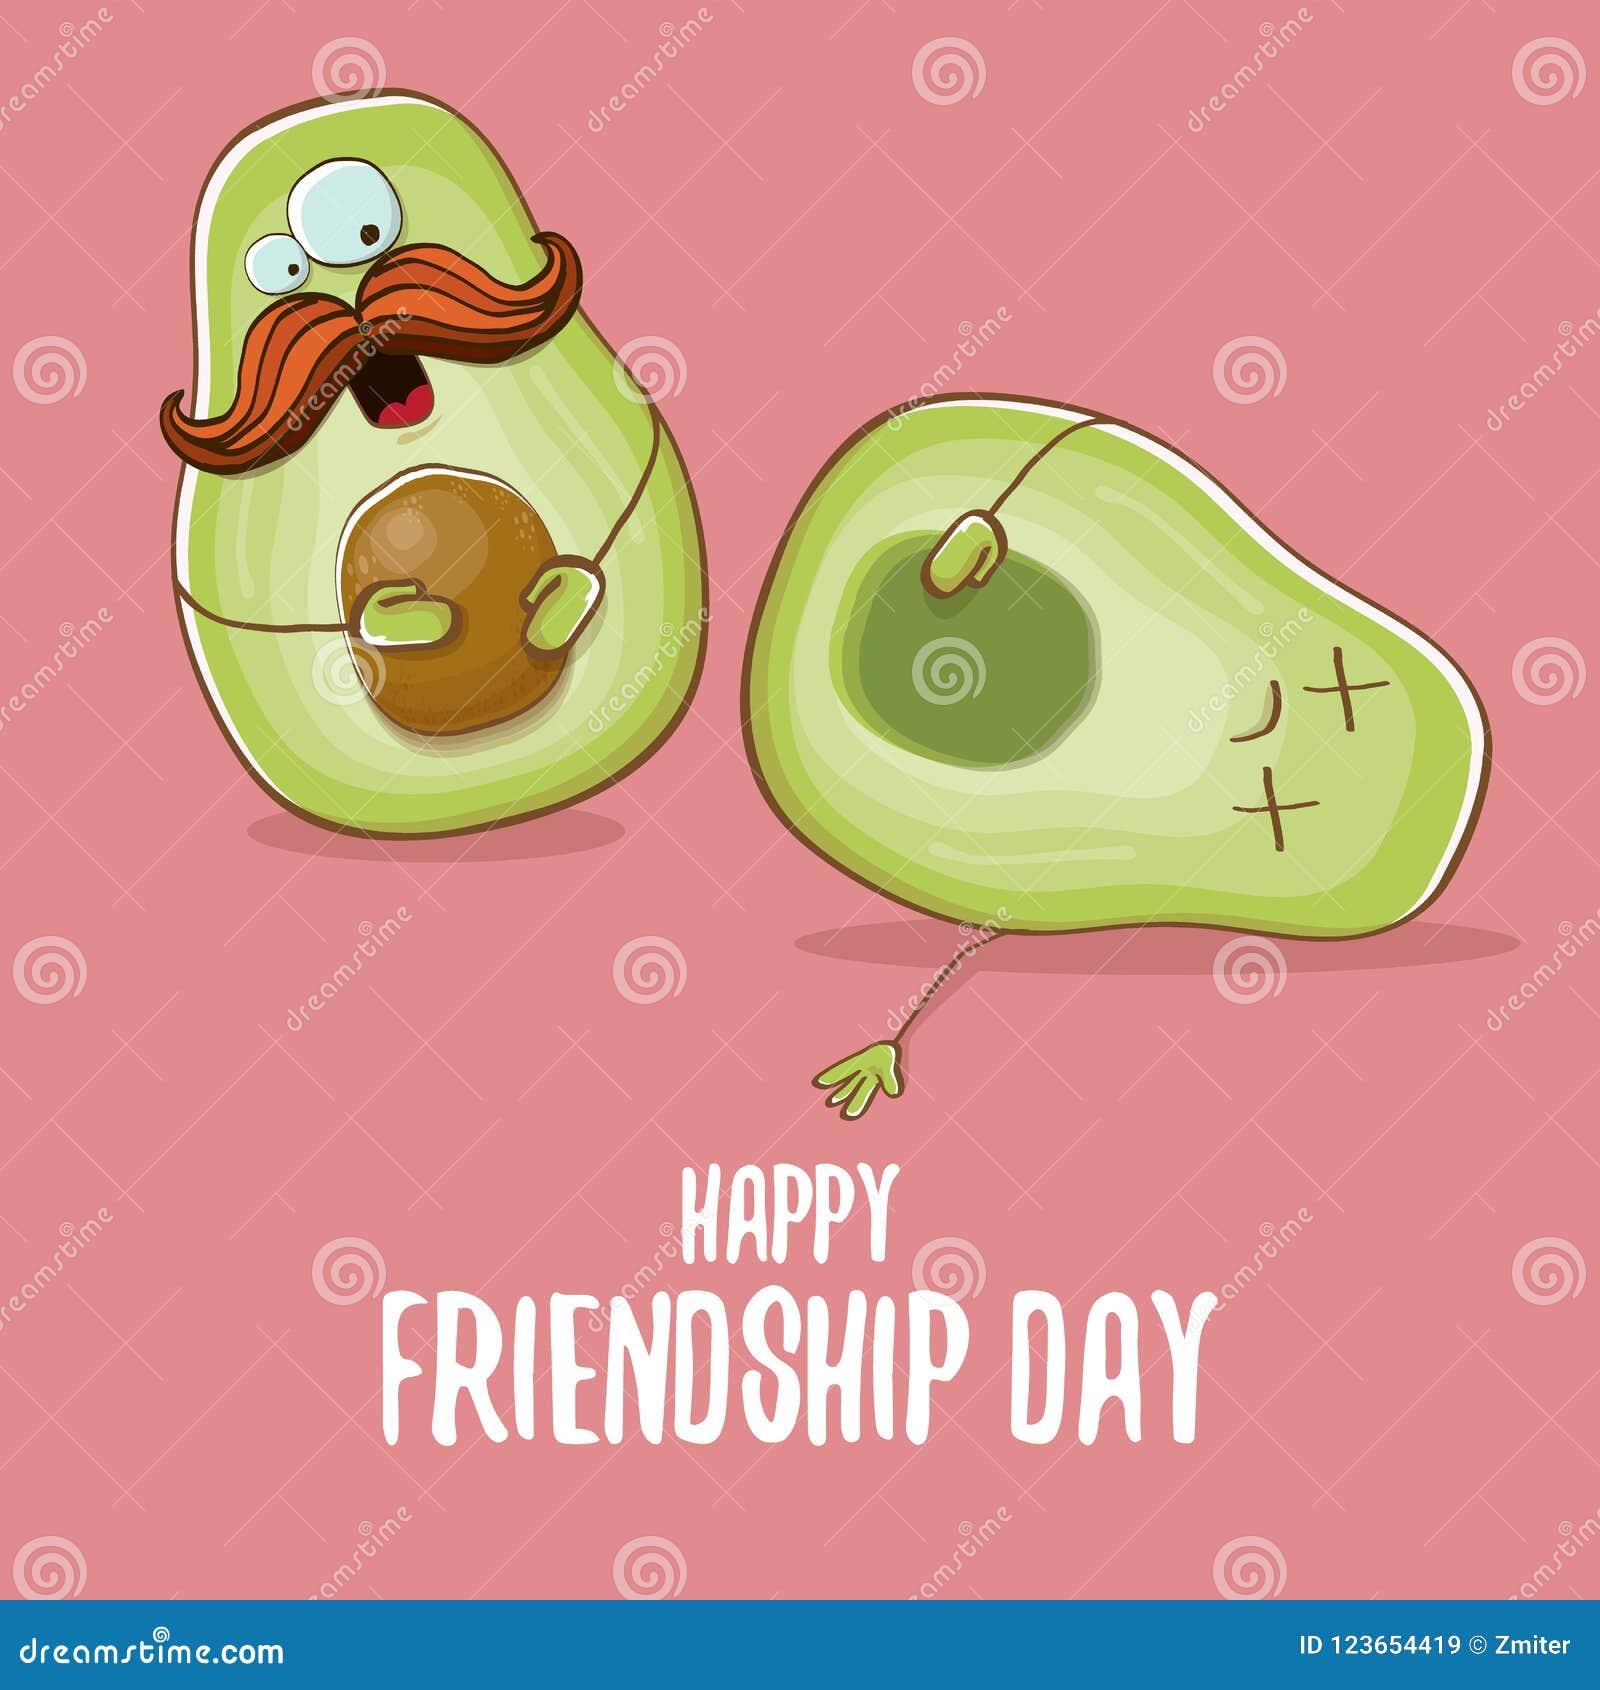 Happy friendship day cartoon comic greeting card with two green download happy friendship day cartoon comic greeting card with two green avocado friends friendship day m4hsunfo